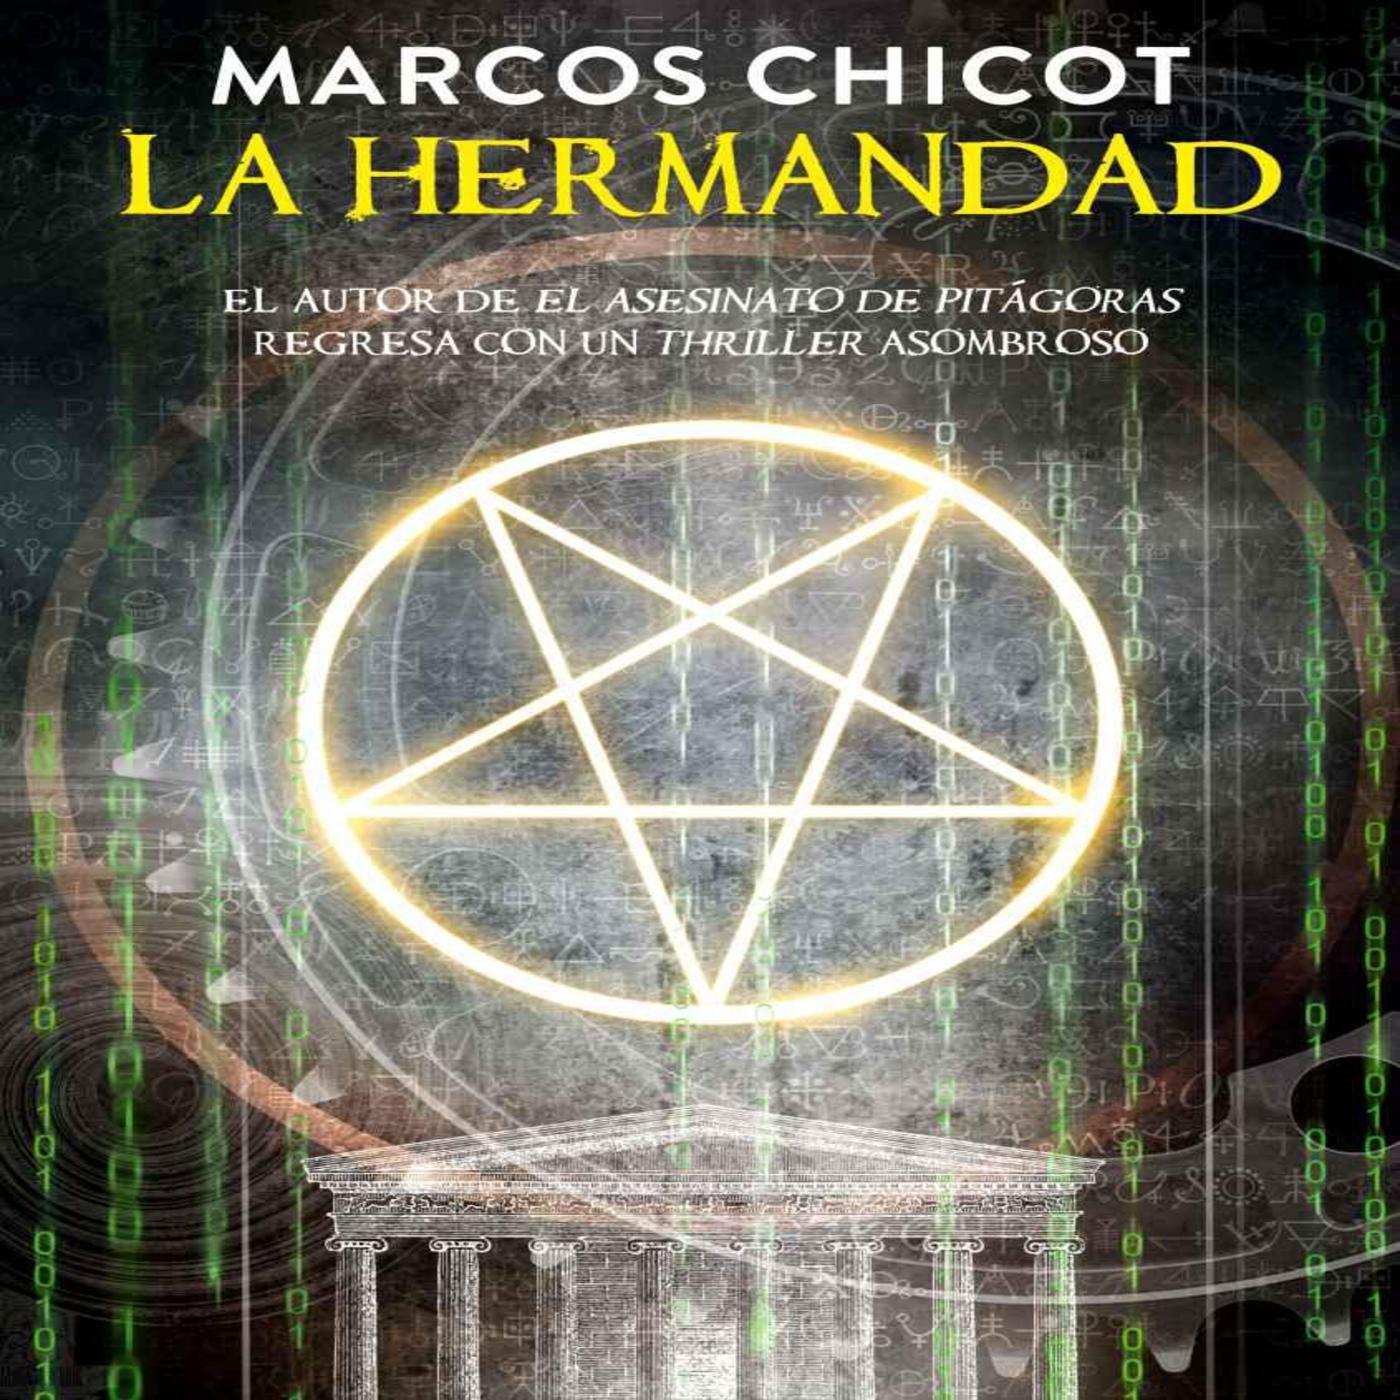 Escucha La Hermandad de Marcos Chicot - iVoox